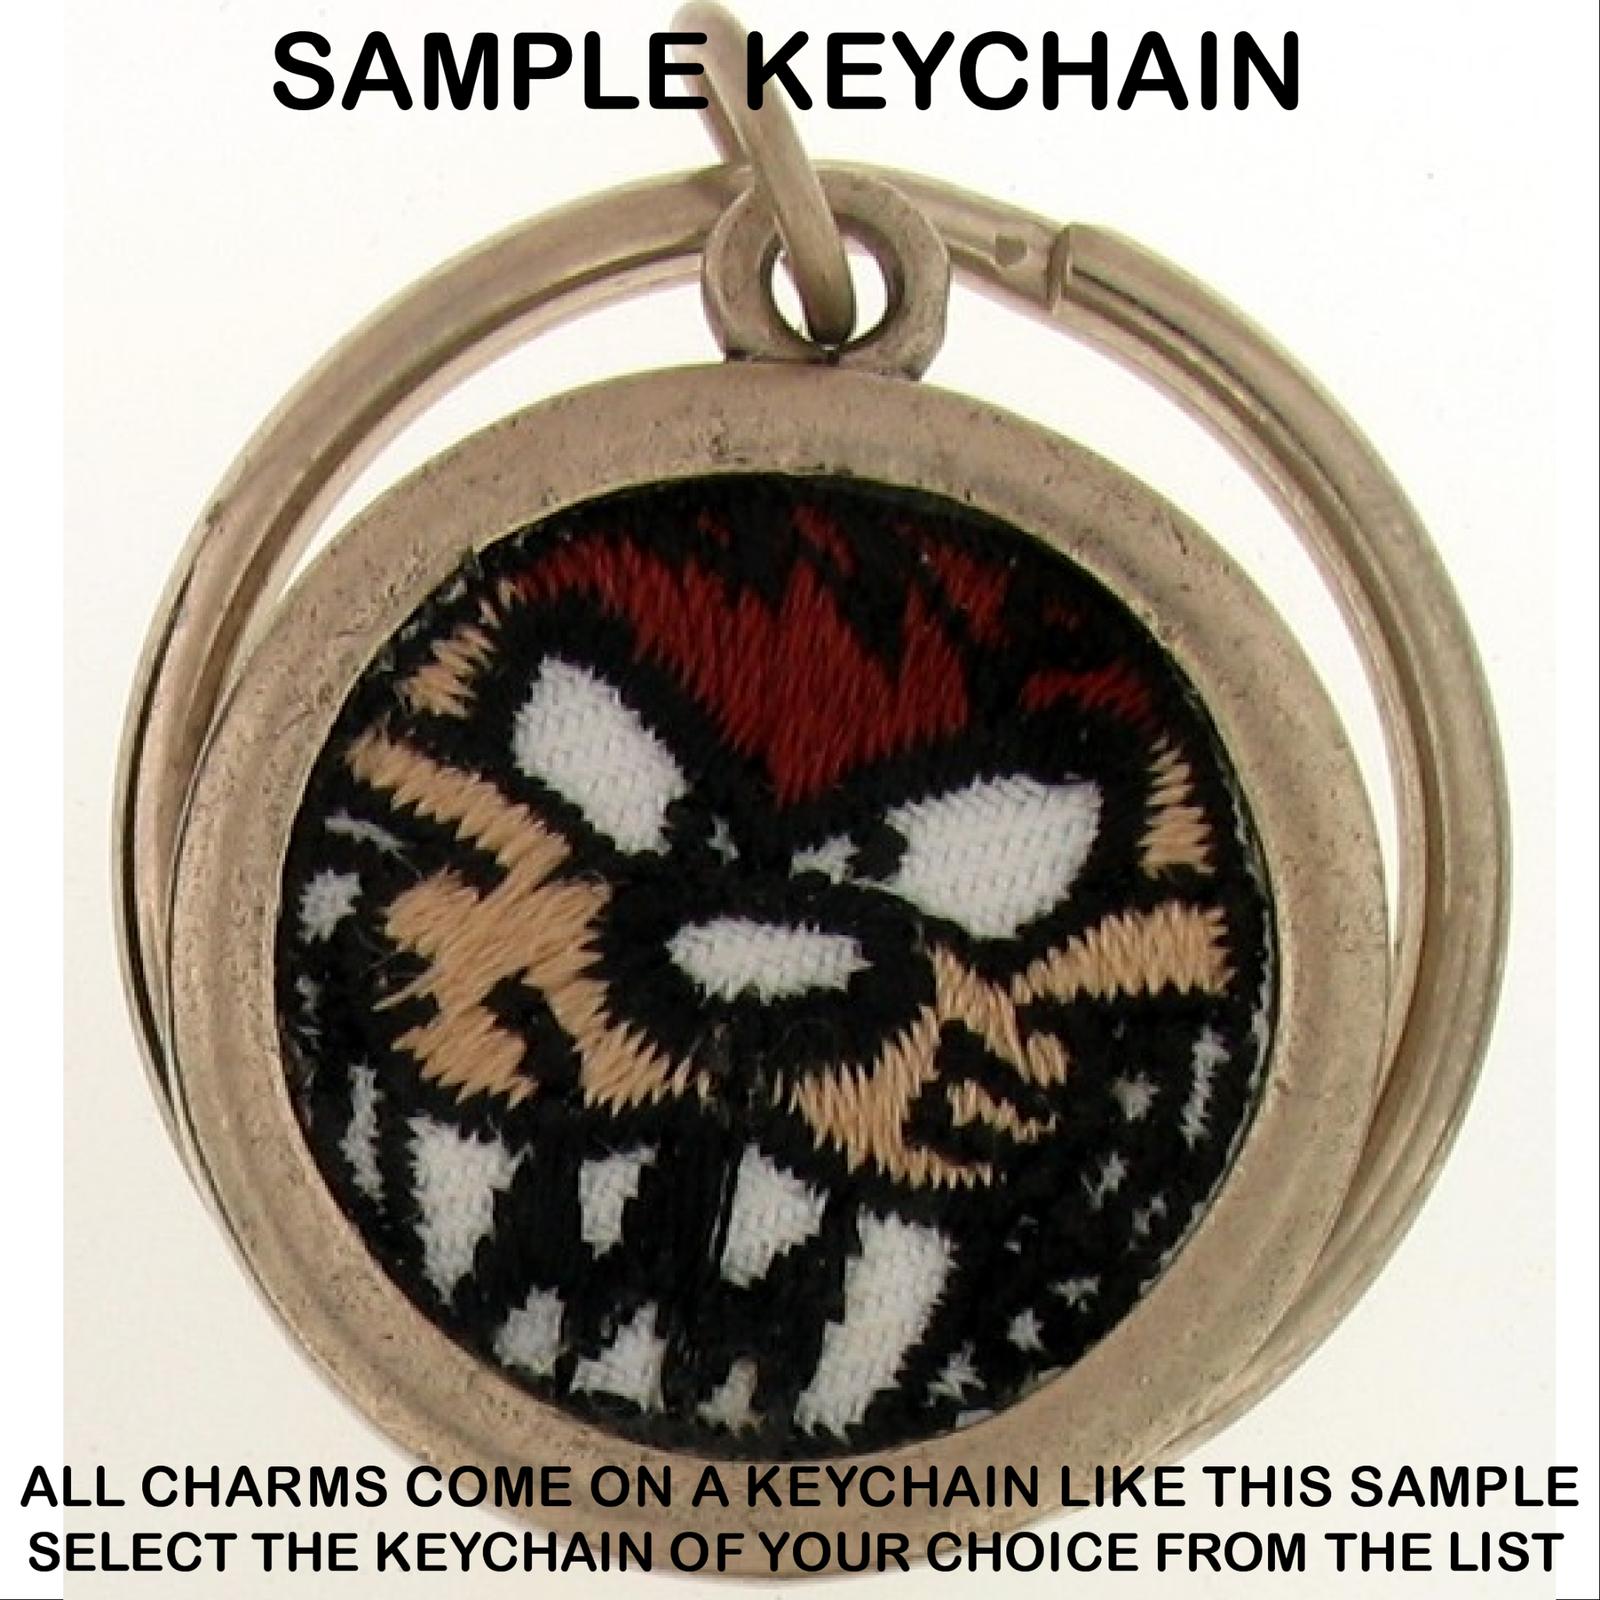 Keychain Taz TASMANIAN Devil LOONEY TUNES Warner Brothers Character Choice 0011w